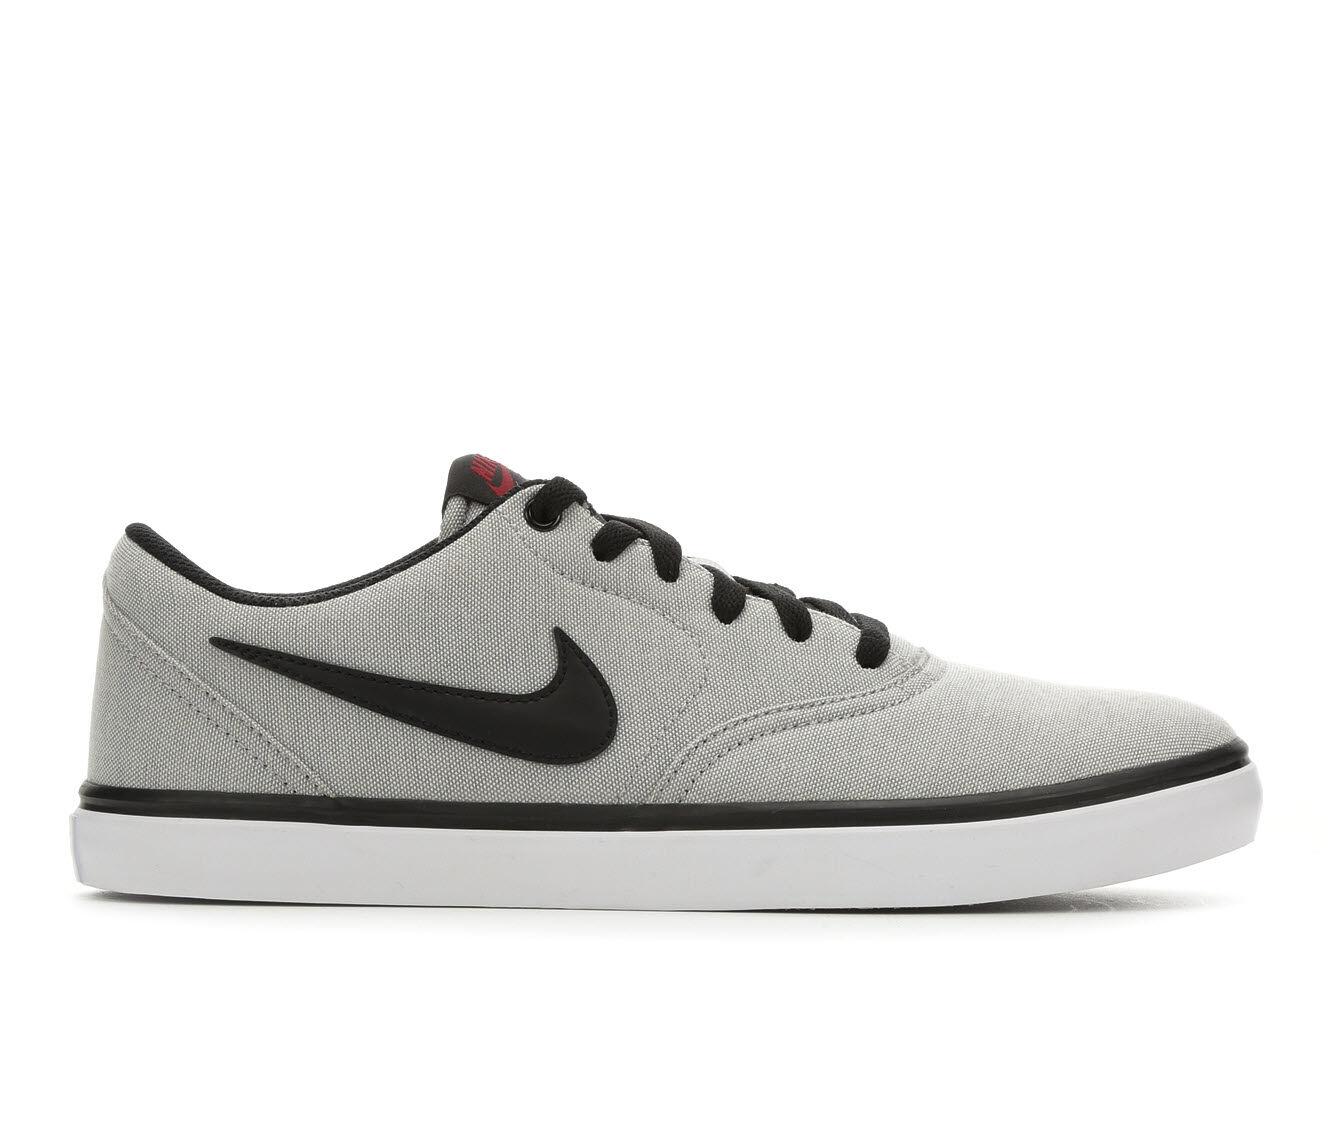 Men's Nike SB Check Solar Canvas Skate Shoes Gry/Blk/Wht 016